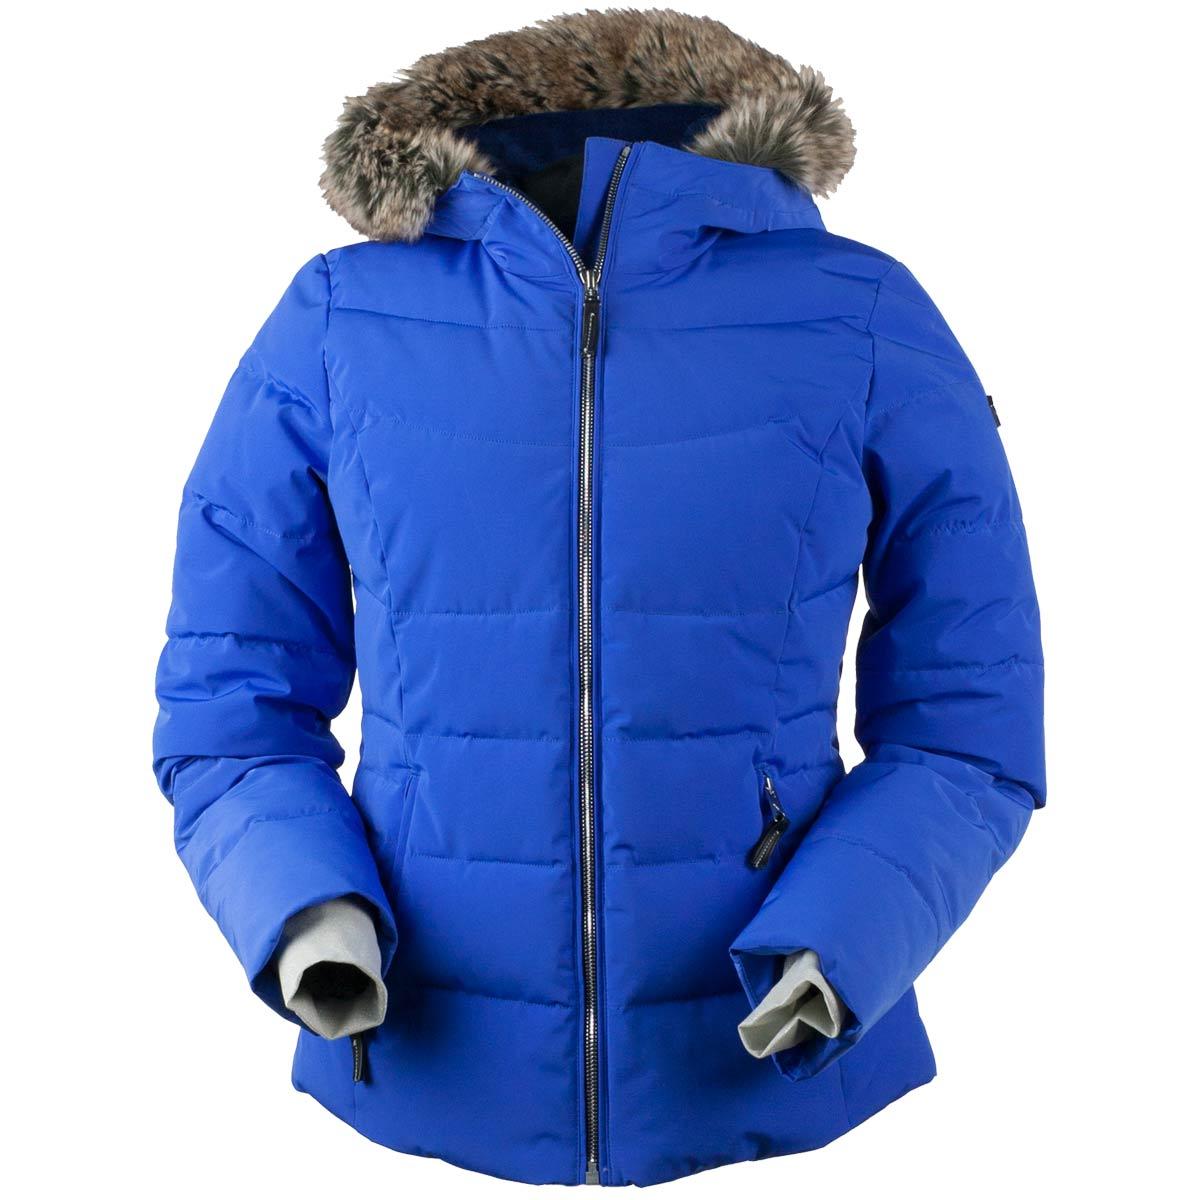 Obermeyer womens ski jacket sizing